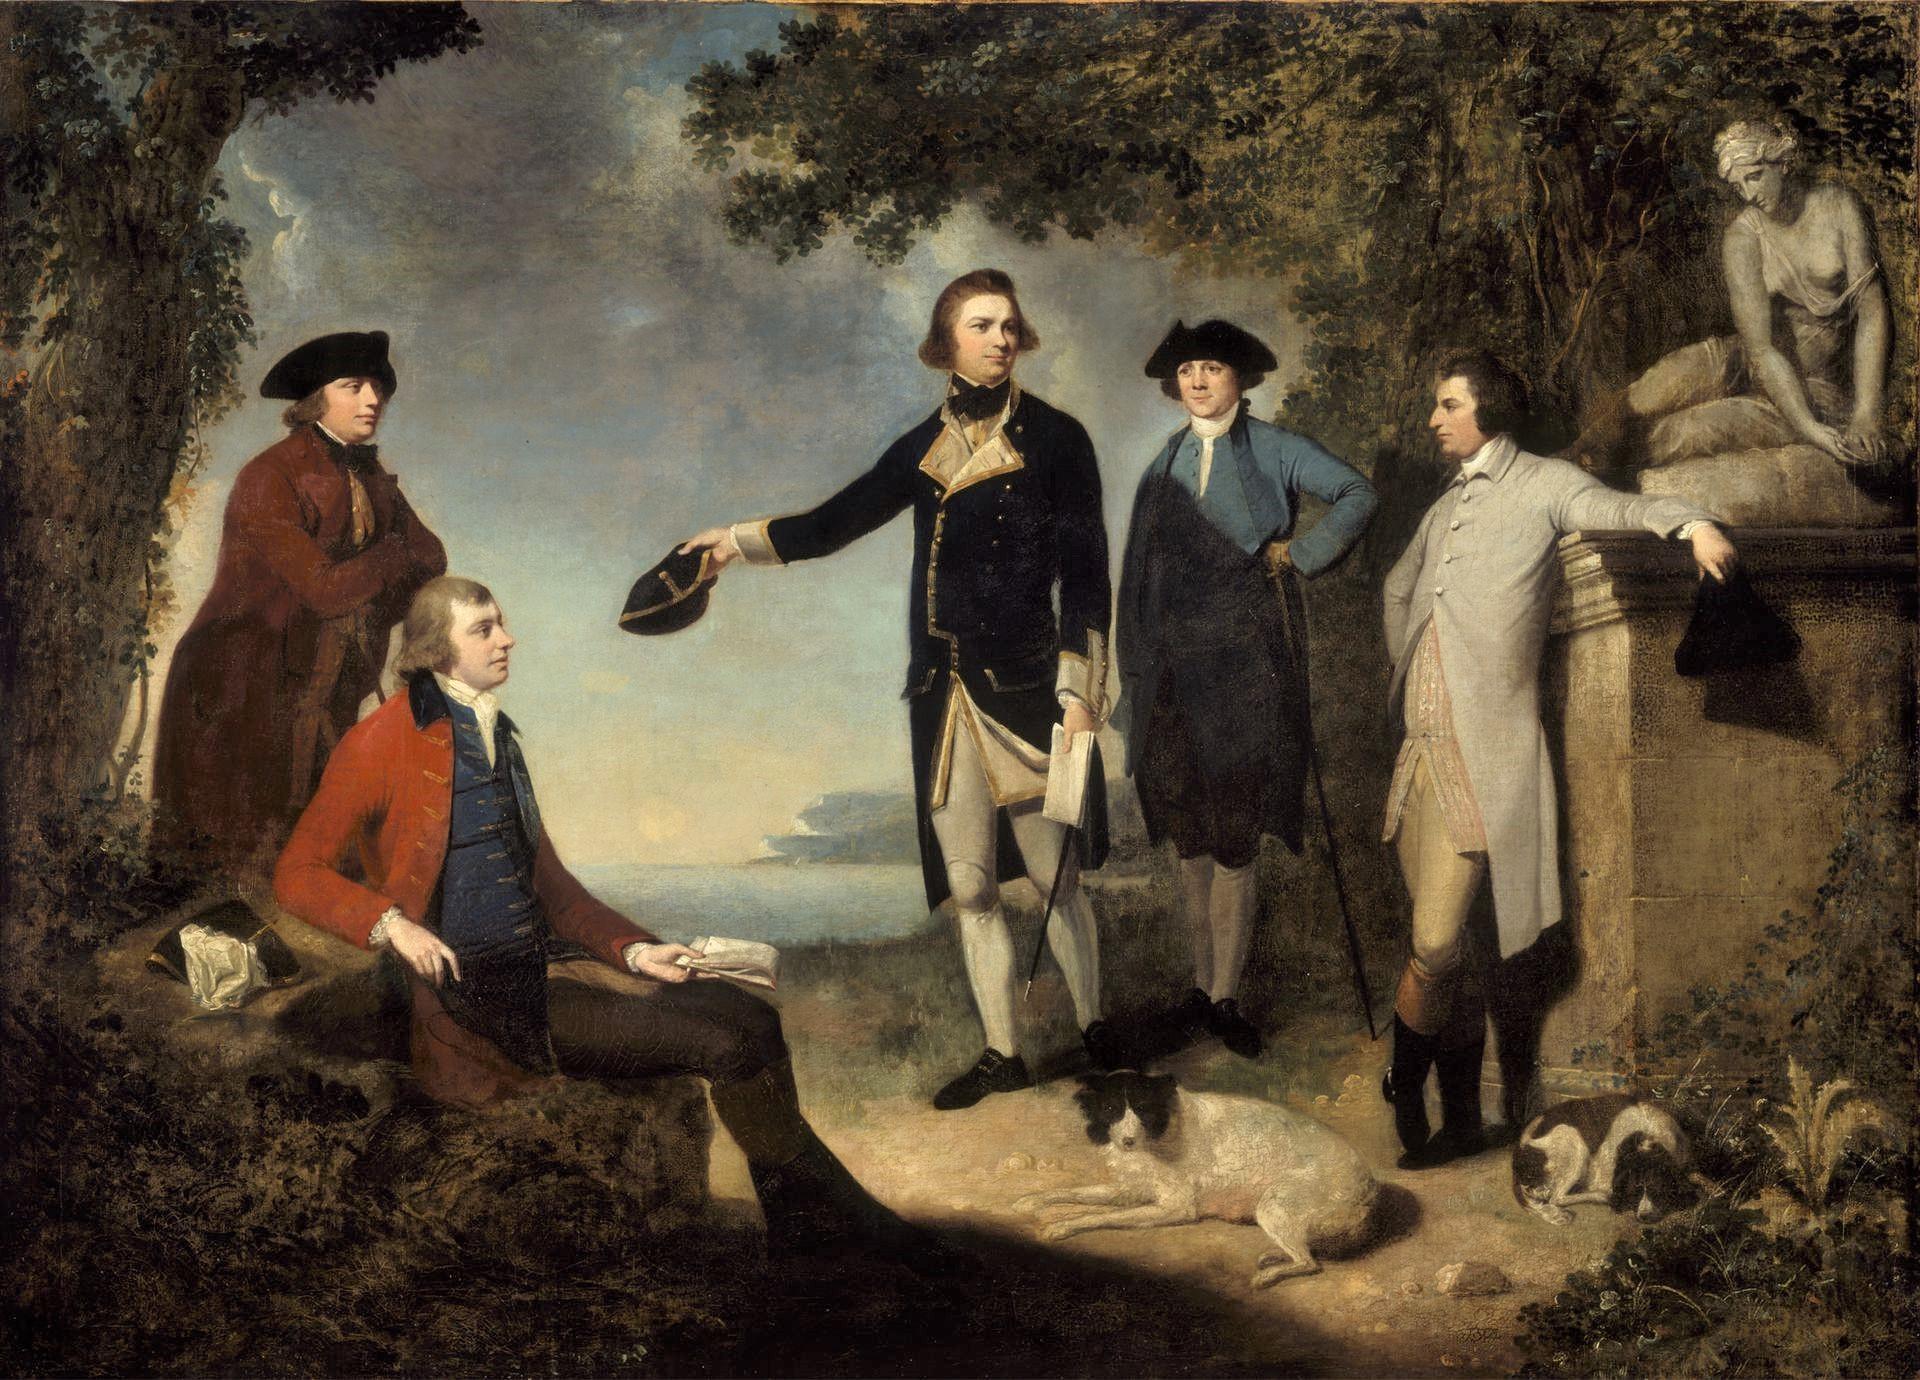 Mortimer - Captain James Cook, Sir Joseph Banks, Lord Sandwich, Dr Daniel Solander and Dr John Hawkesworth.jpg